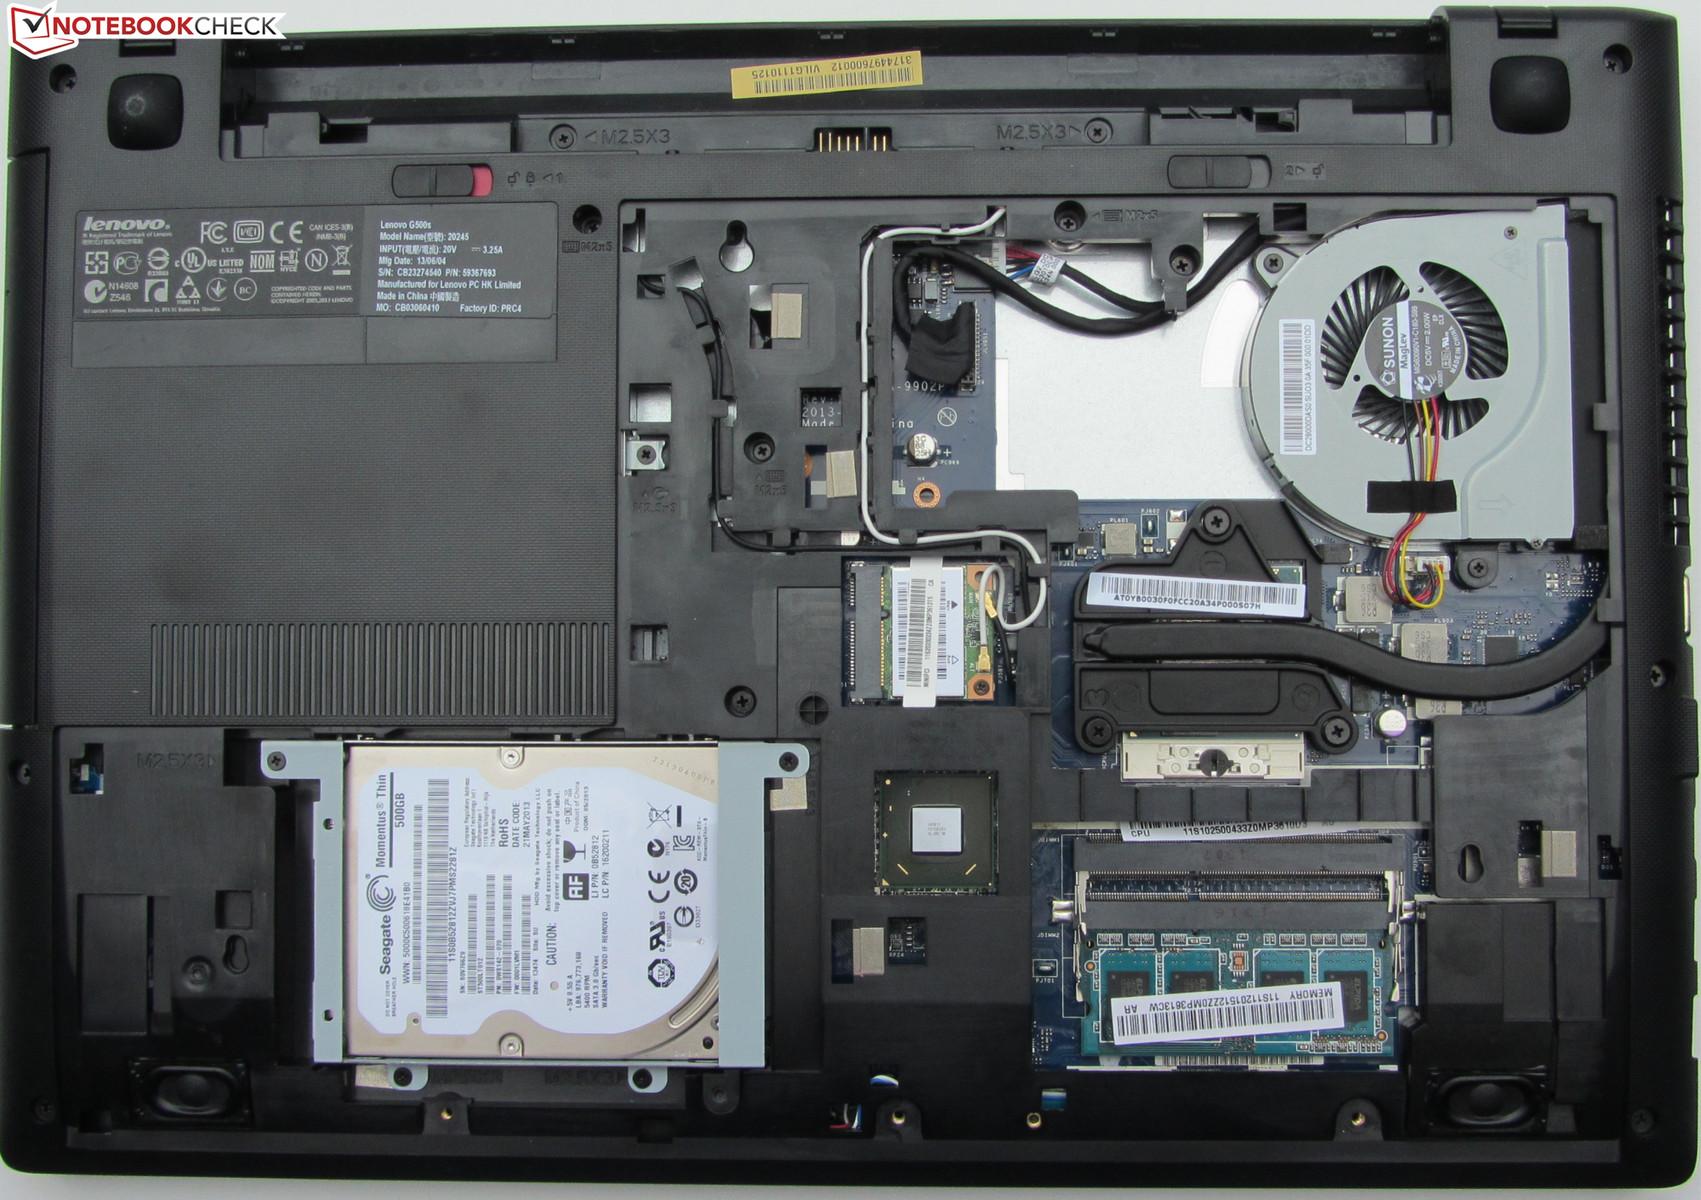 Review Lenovo G500s 59367693 Notebook Notebookcheck Net